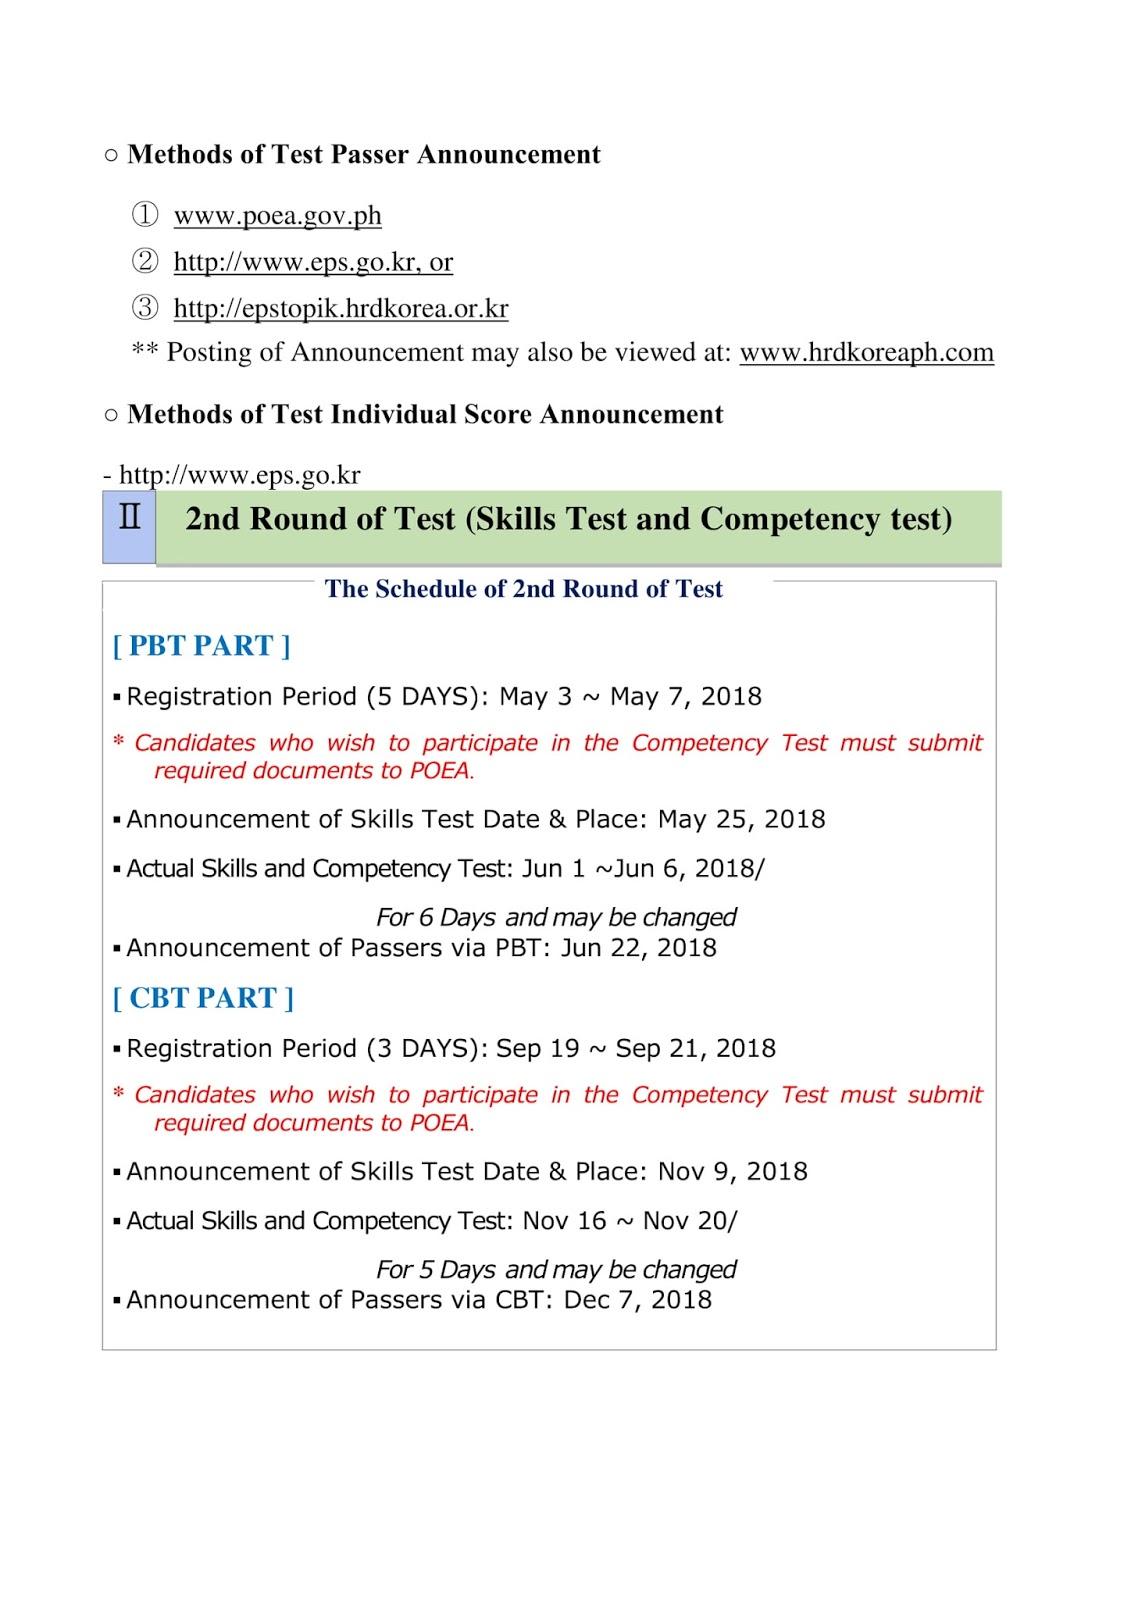 2018 application form eps topik test skills test by poea and hrd rh pinoyseoul com POEA Job Vacancies EPS-TOPIK HRD Korea Kr